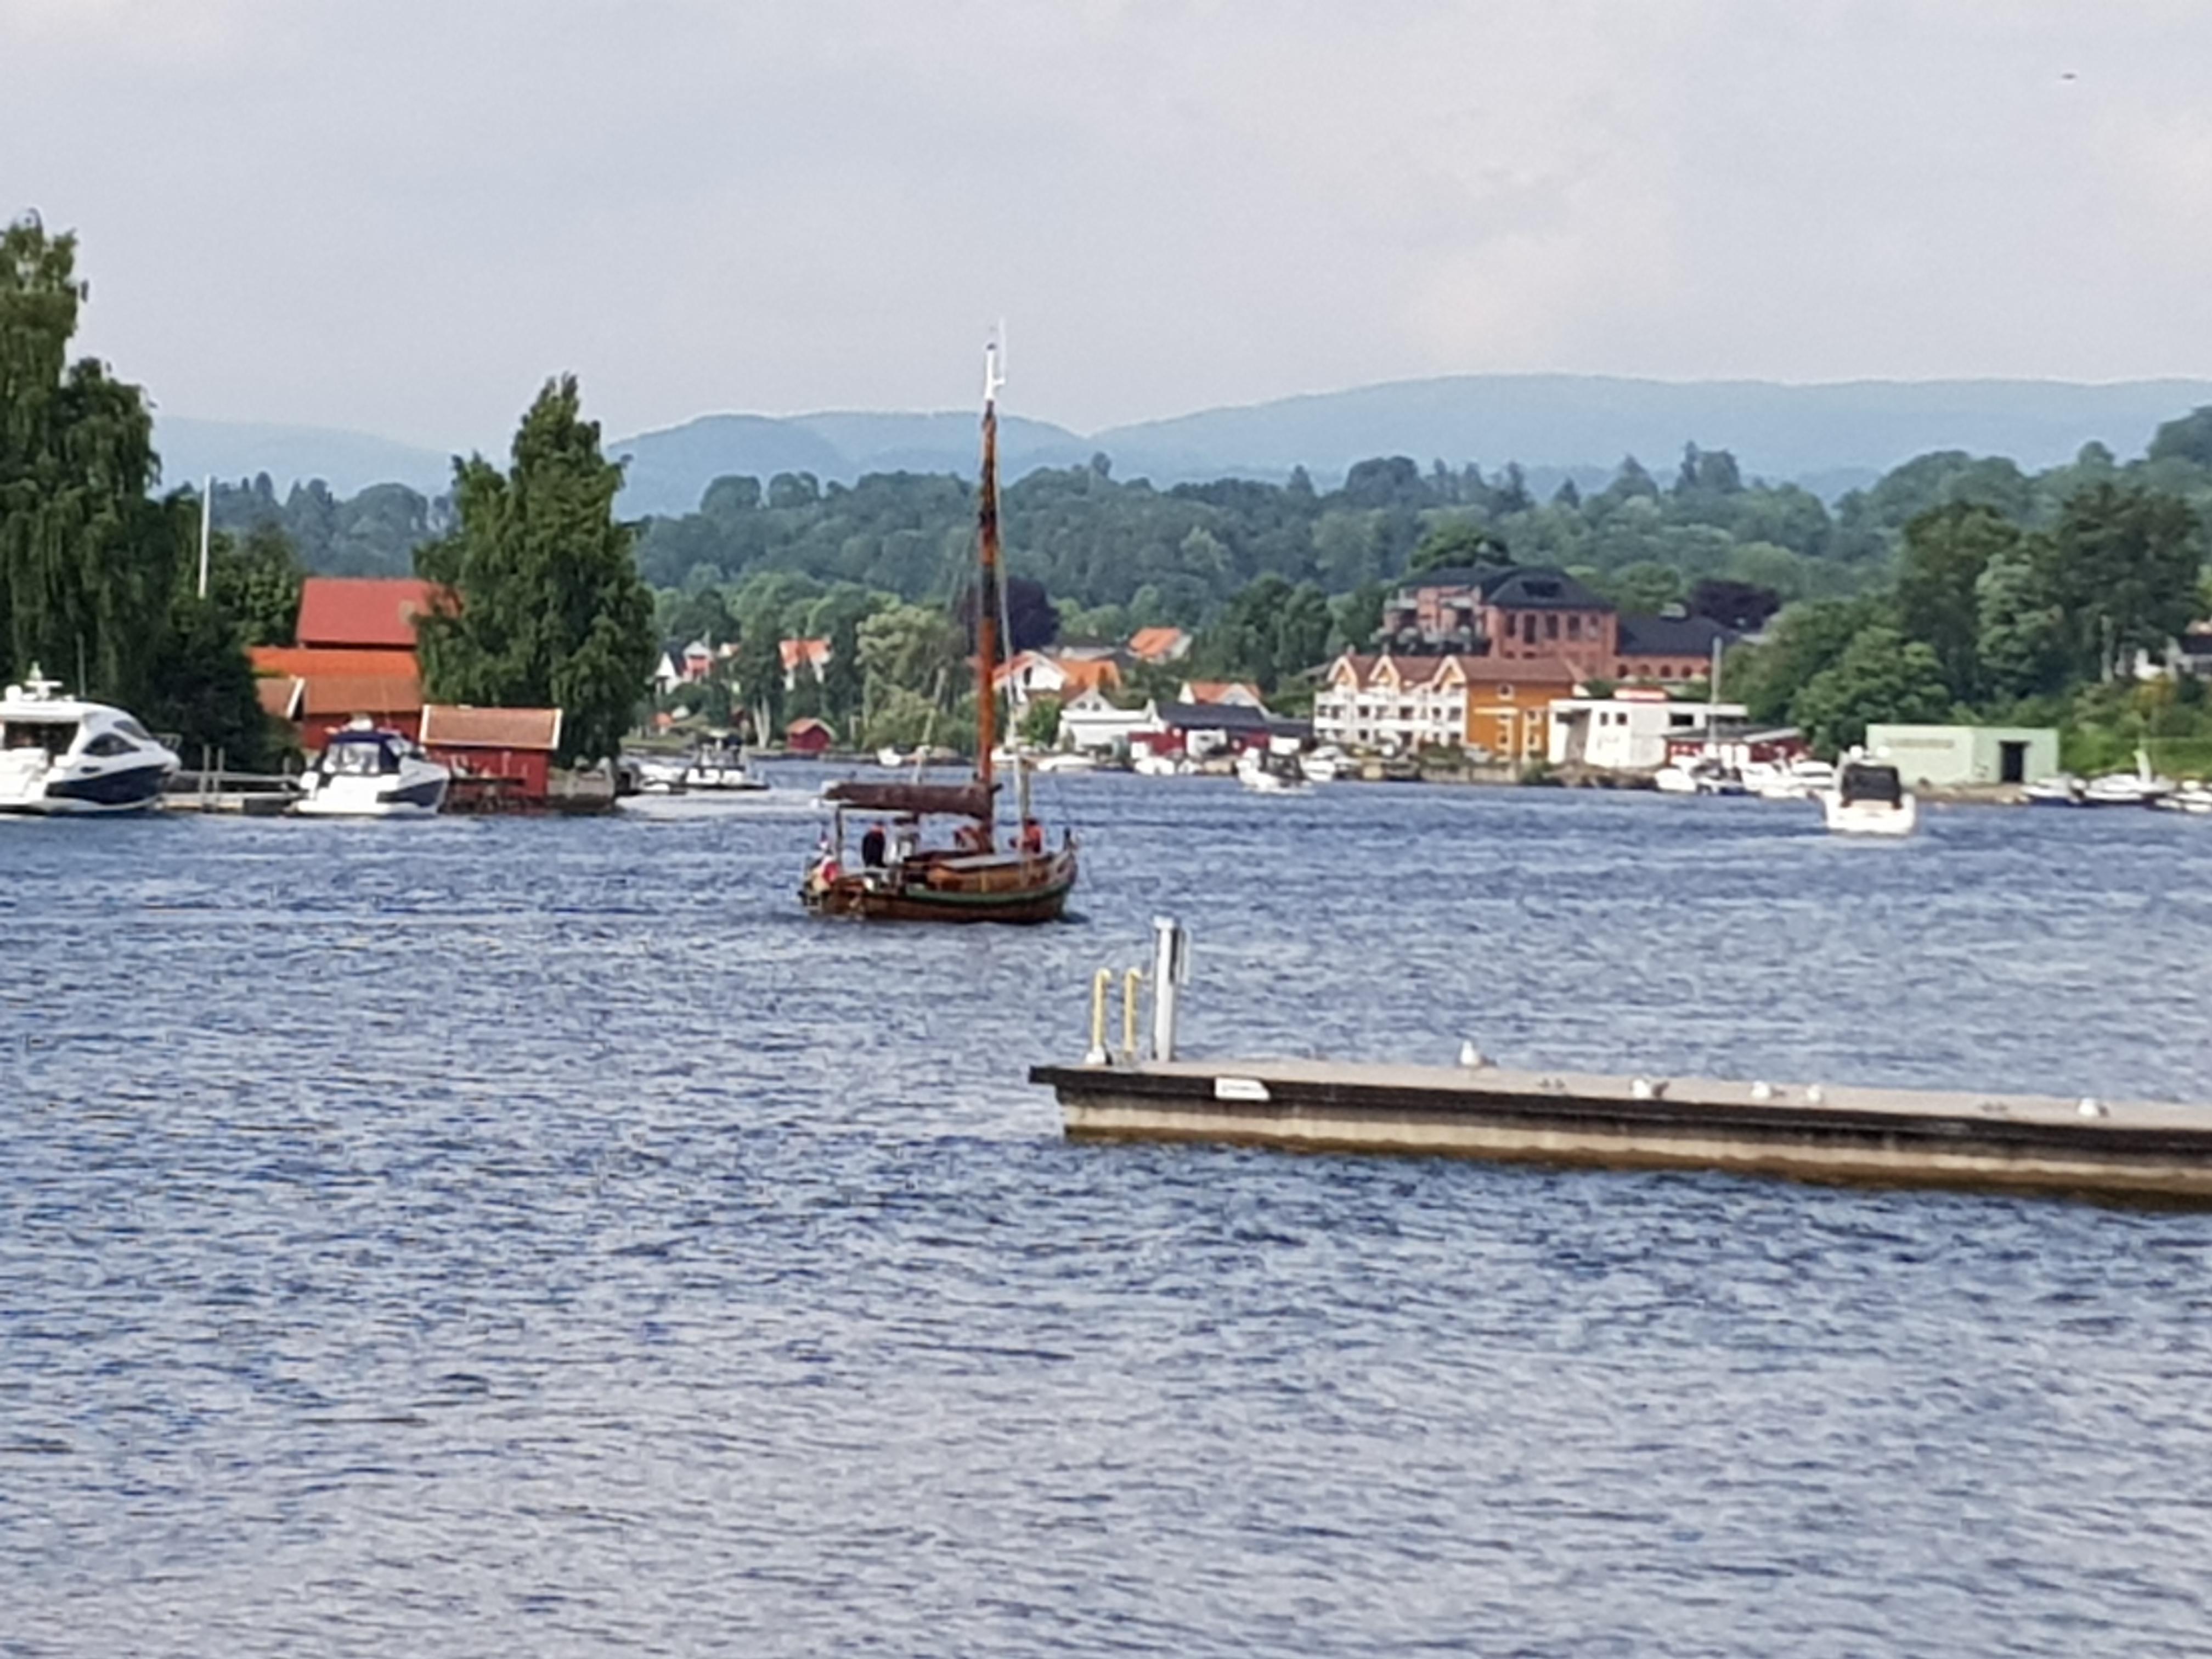 Fjorden Regnskap AS